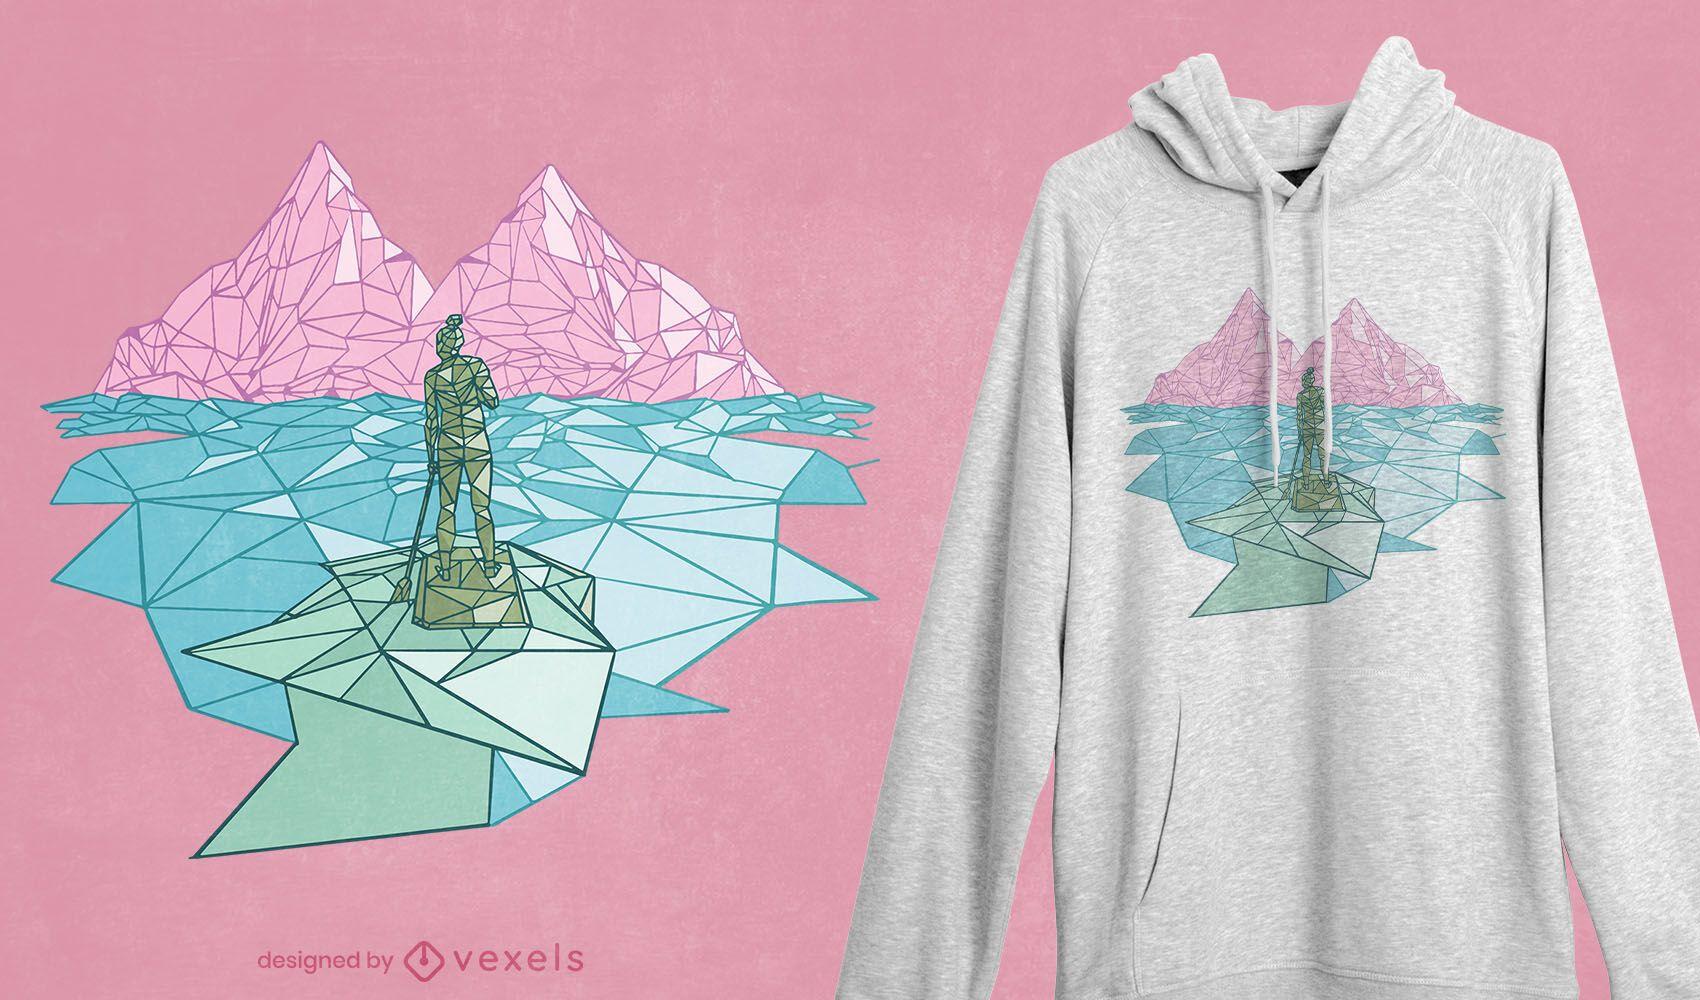 Polygonal paddling t-shirt design